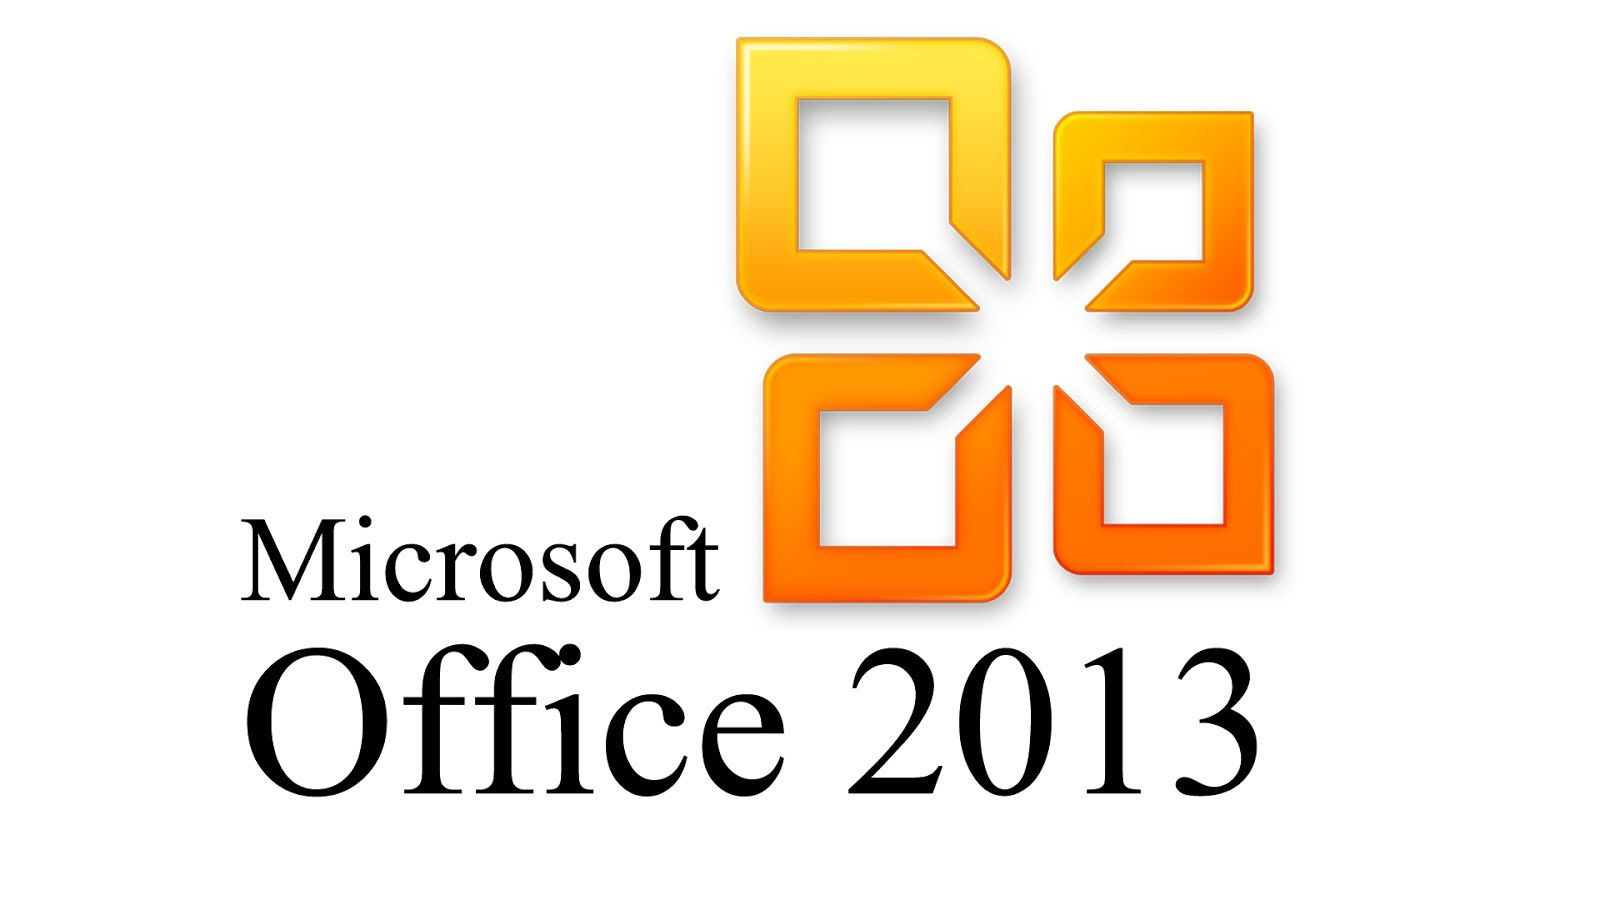 Microsoft Project 2013 Crack Keygen